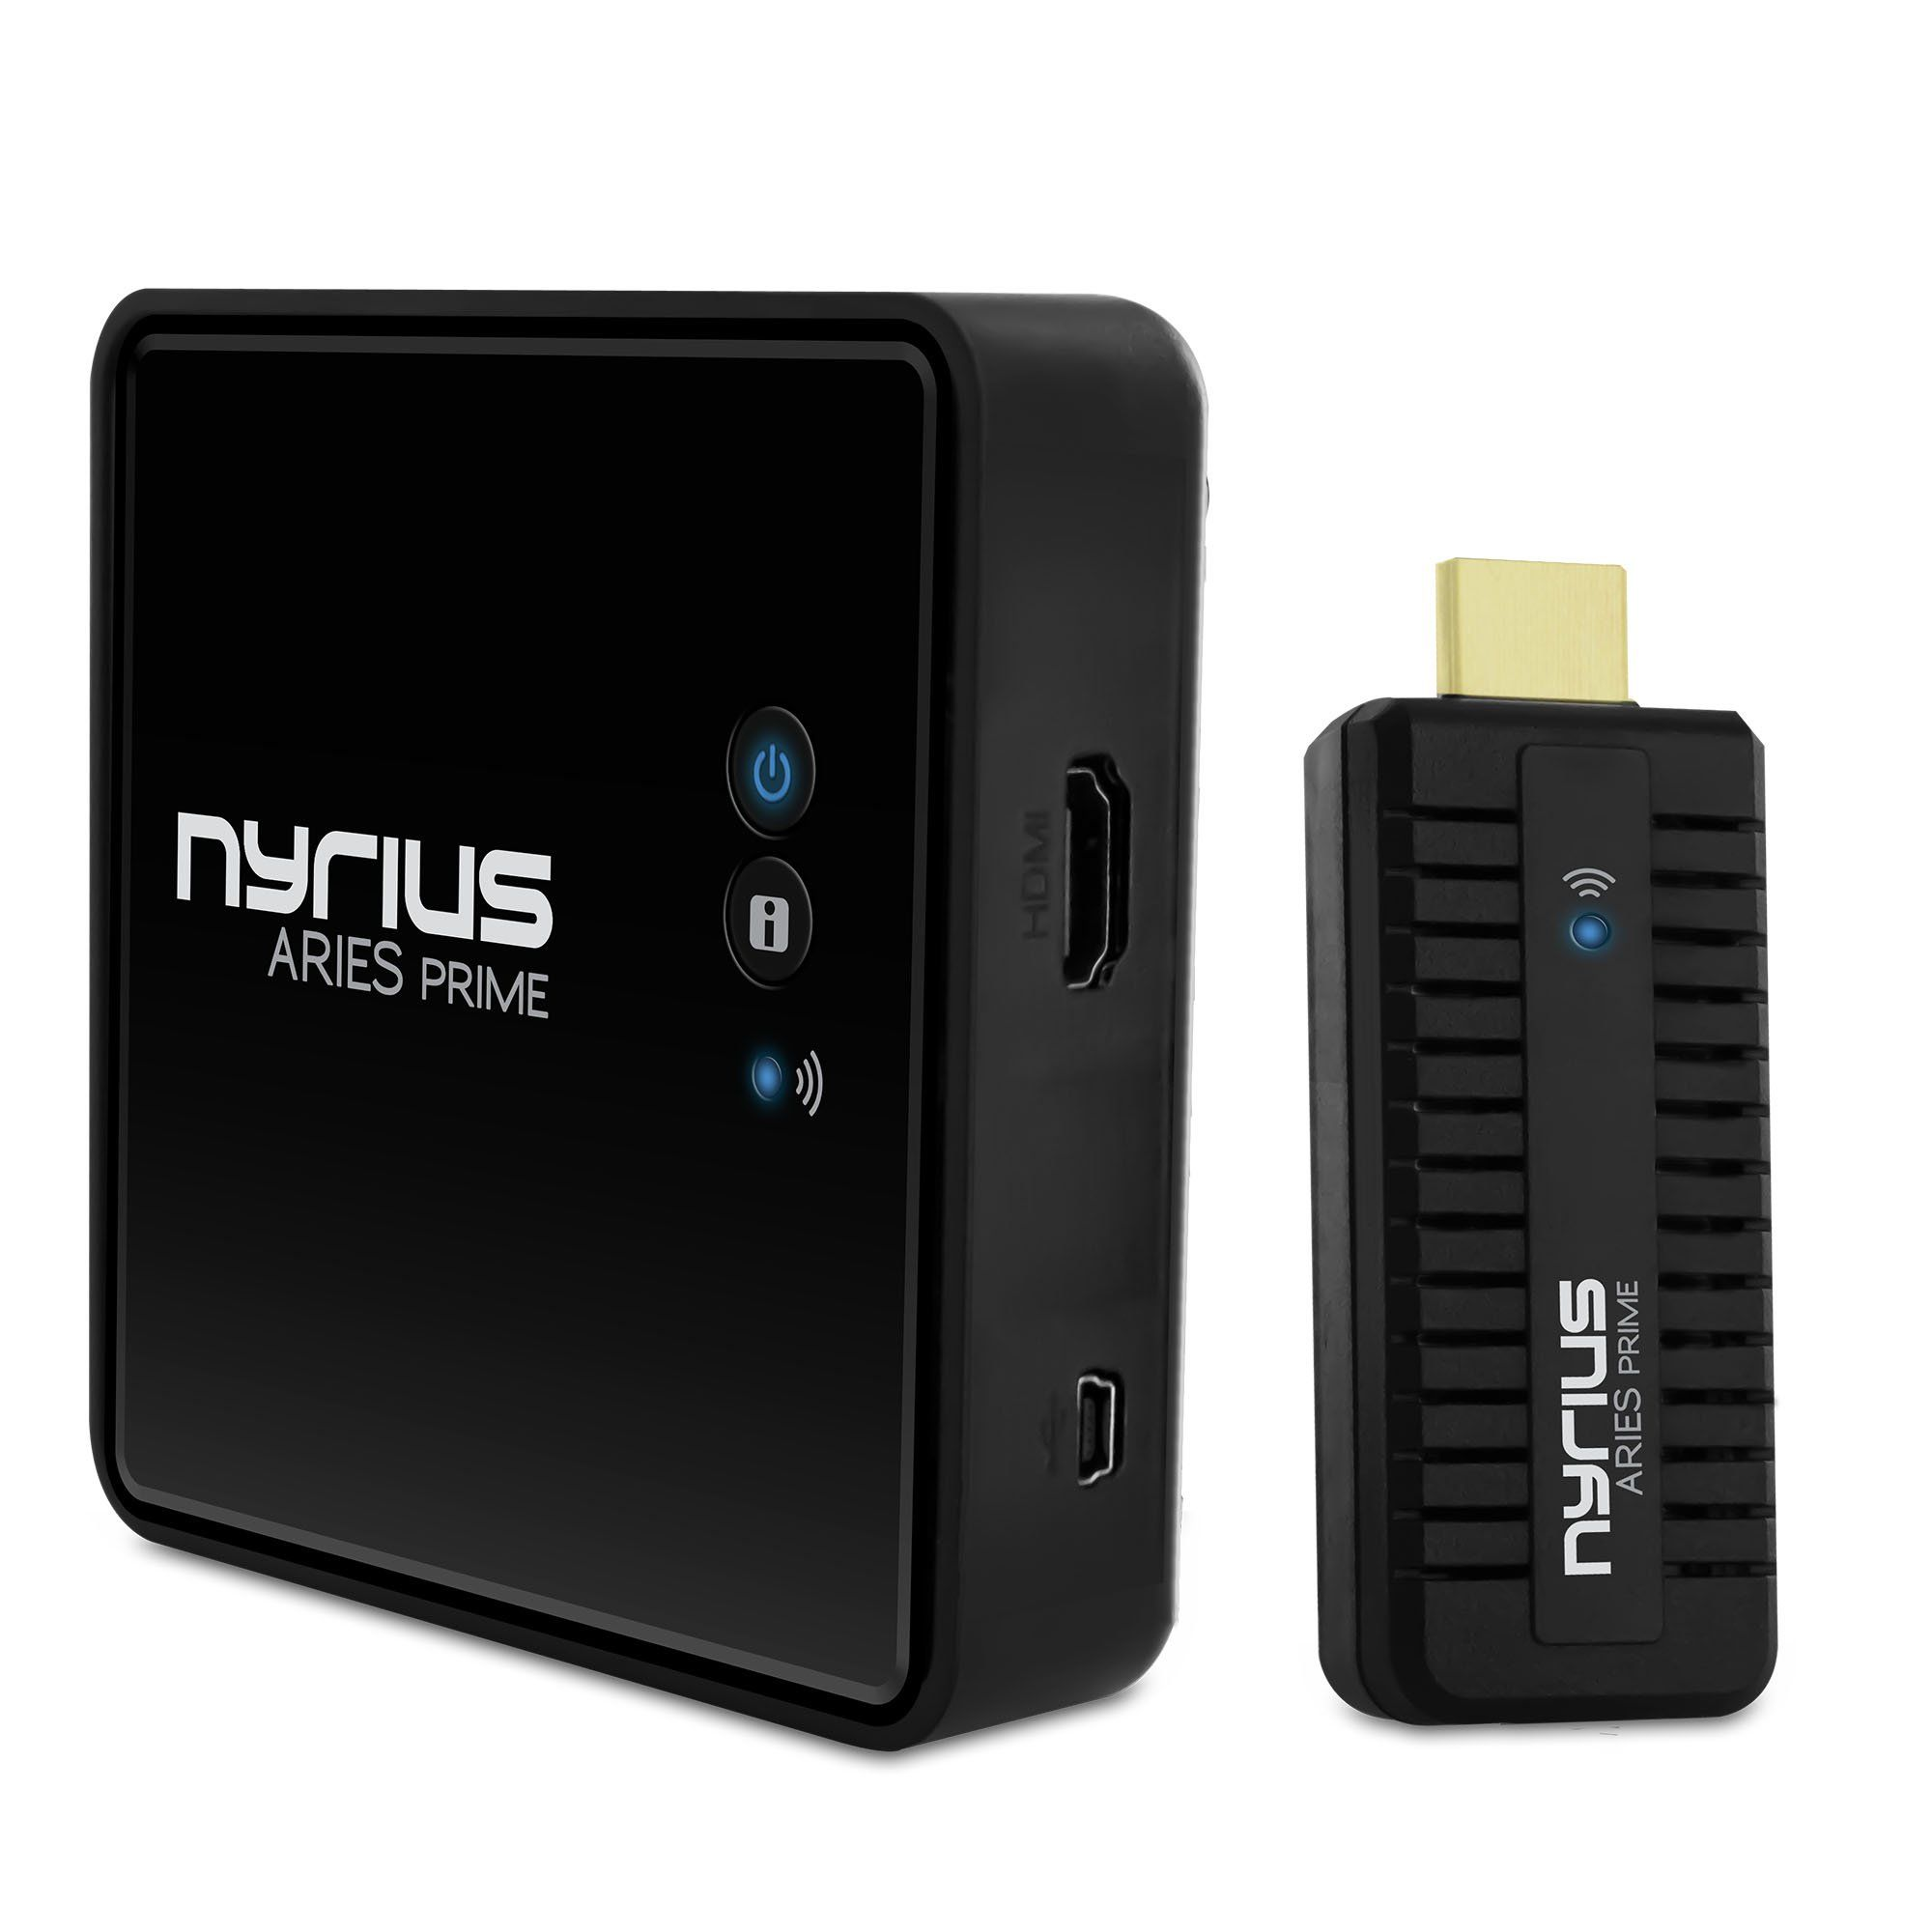 Nyrius ARIES Prime Wireless Video HDMI Transmitter